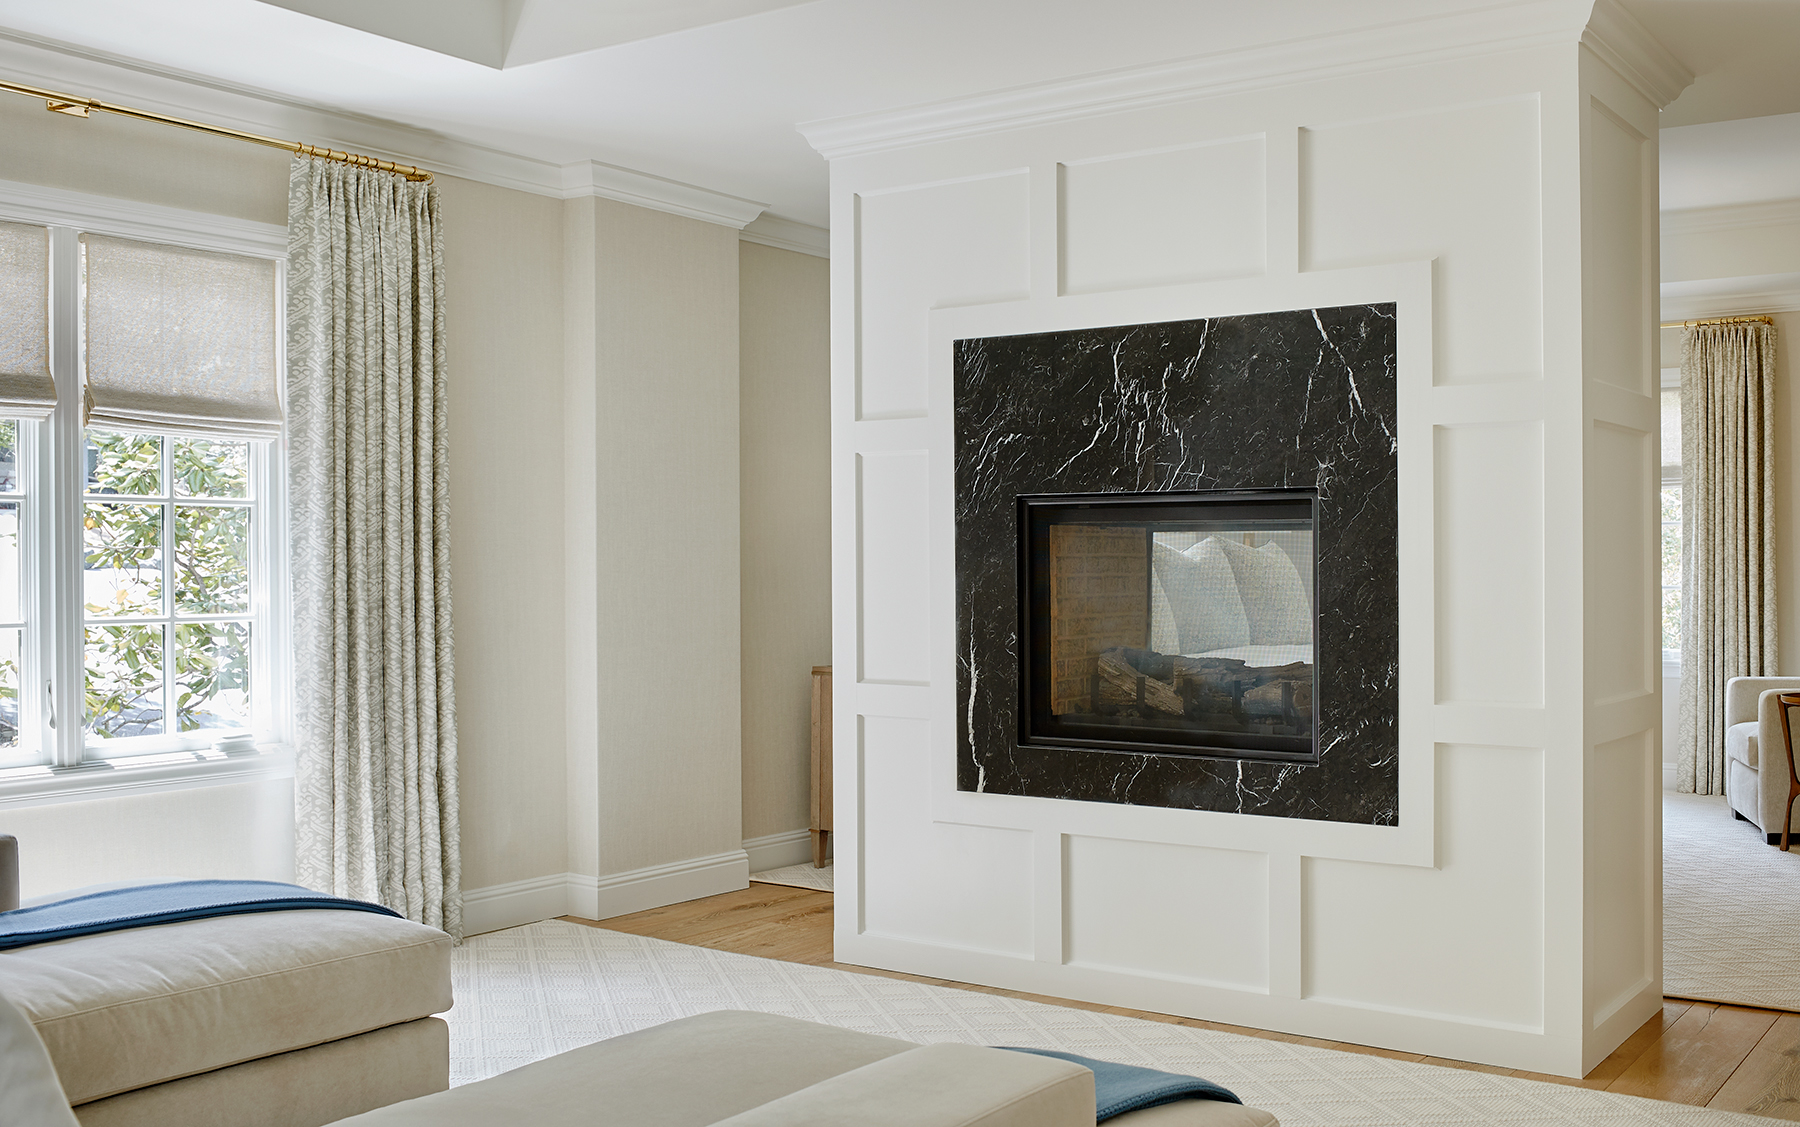 221170_MasterSuite_Fireplace.jpg